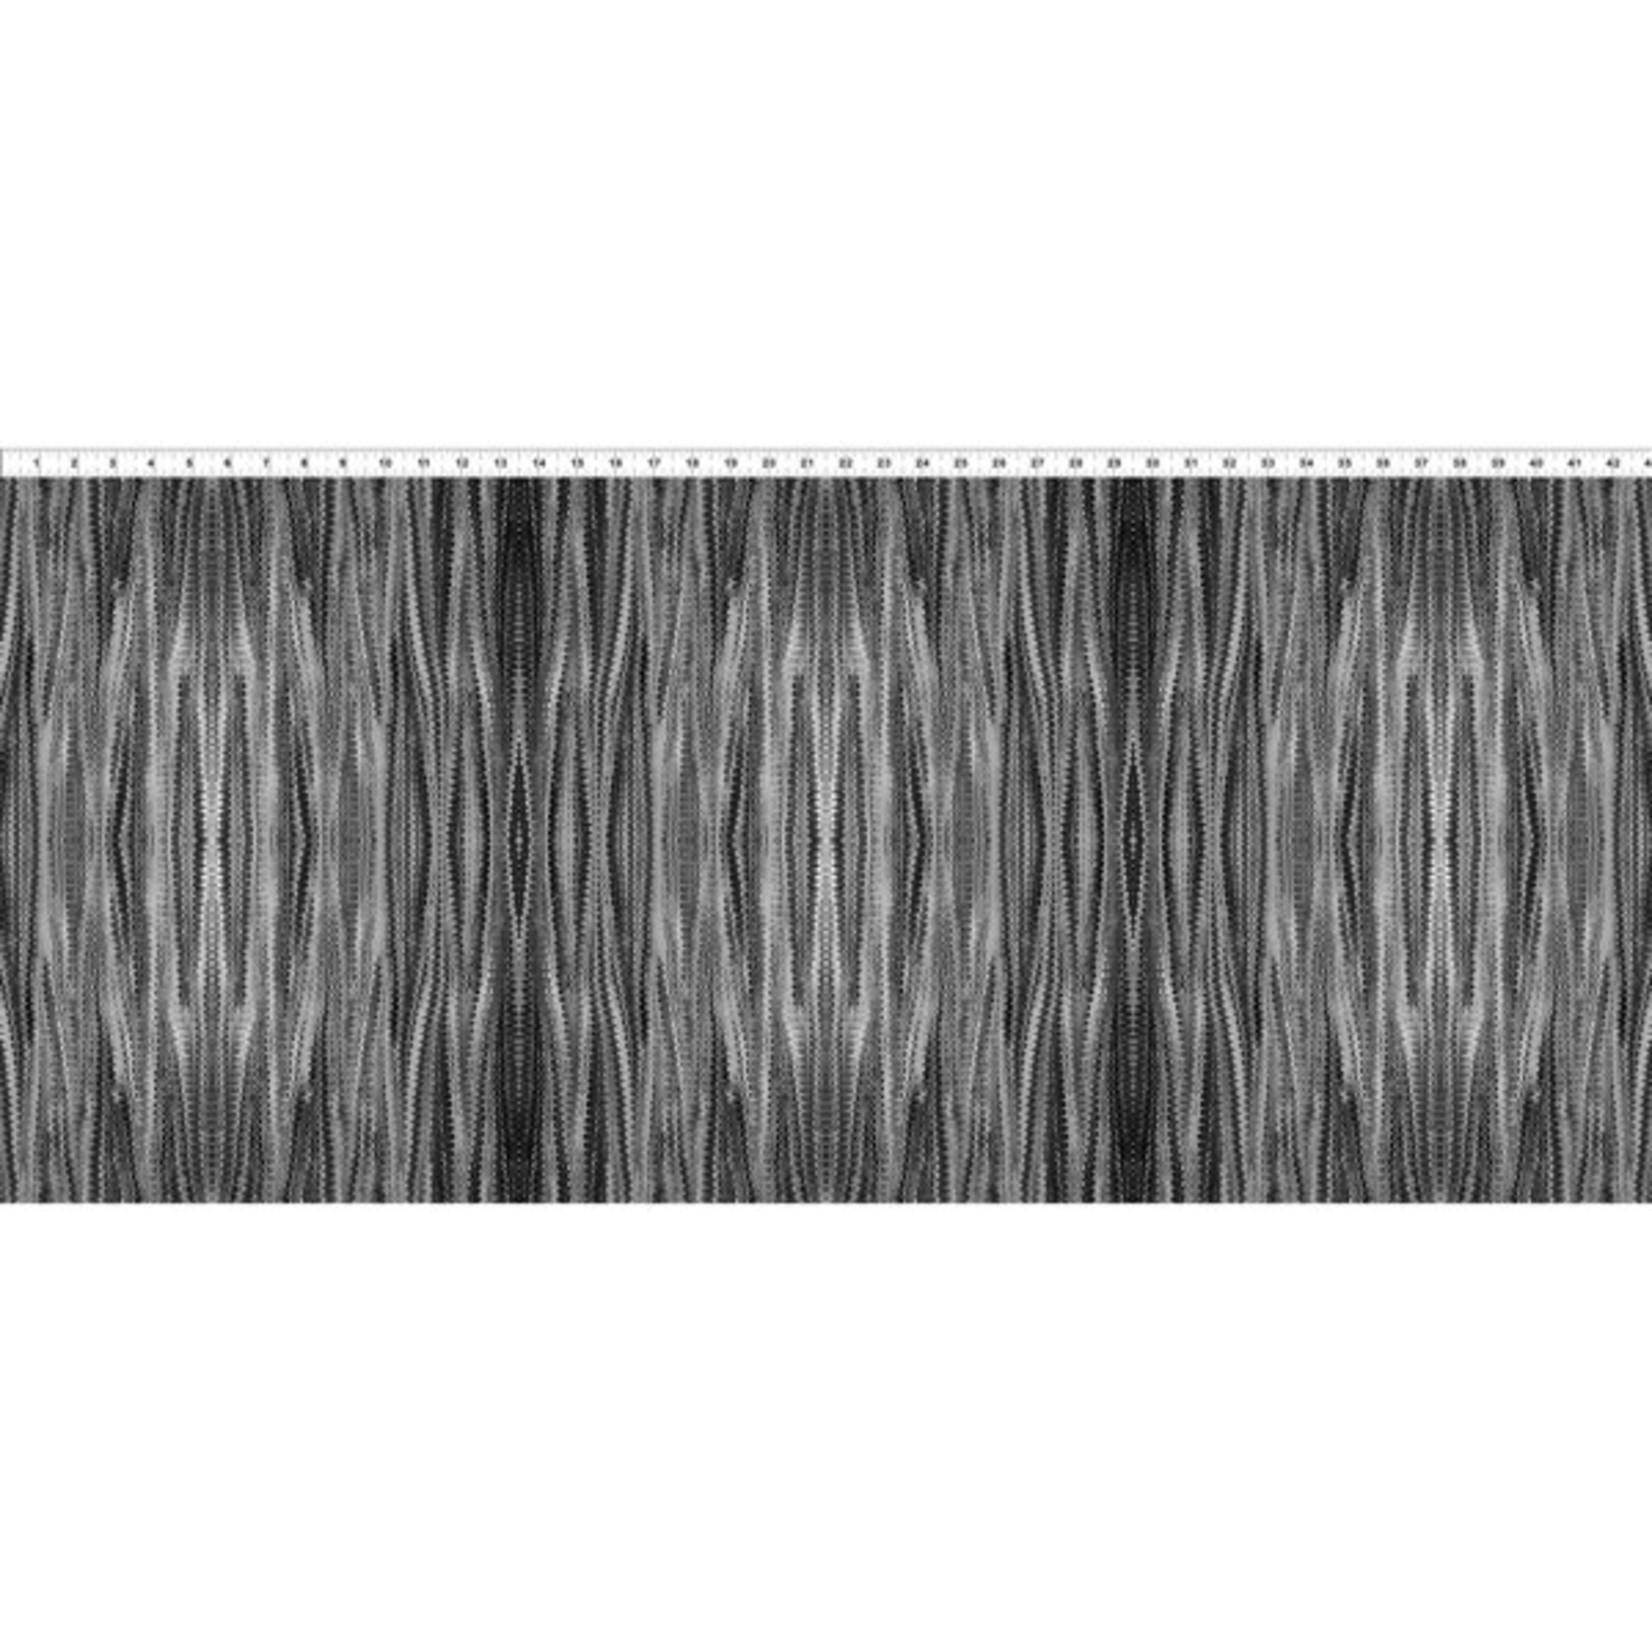 In the Beginning Fabrics Marble Essence - Catania - Dark Gray